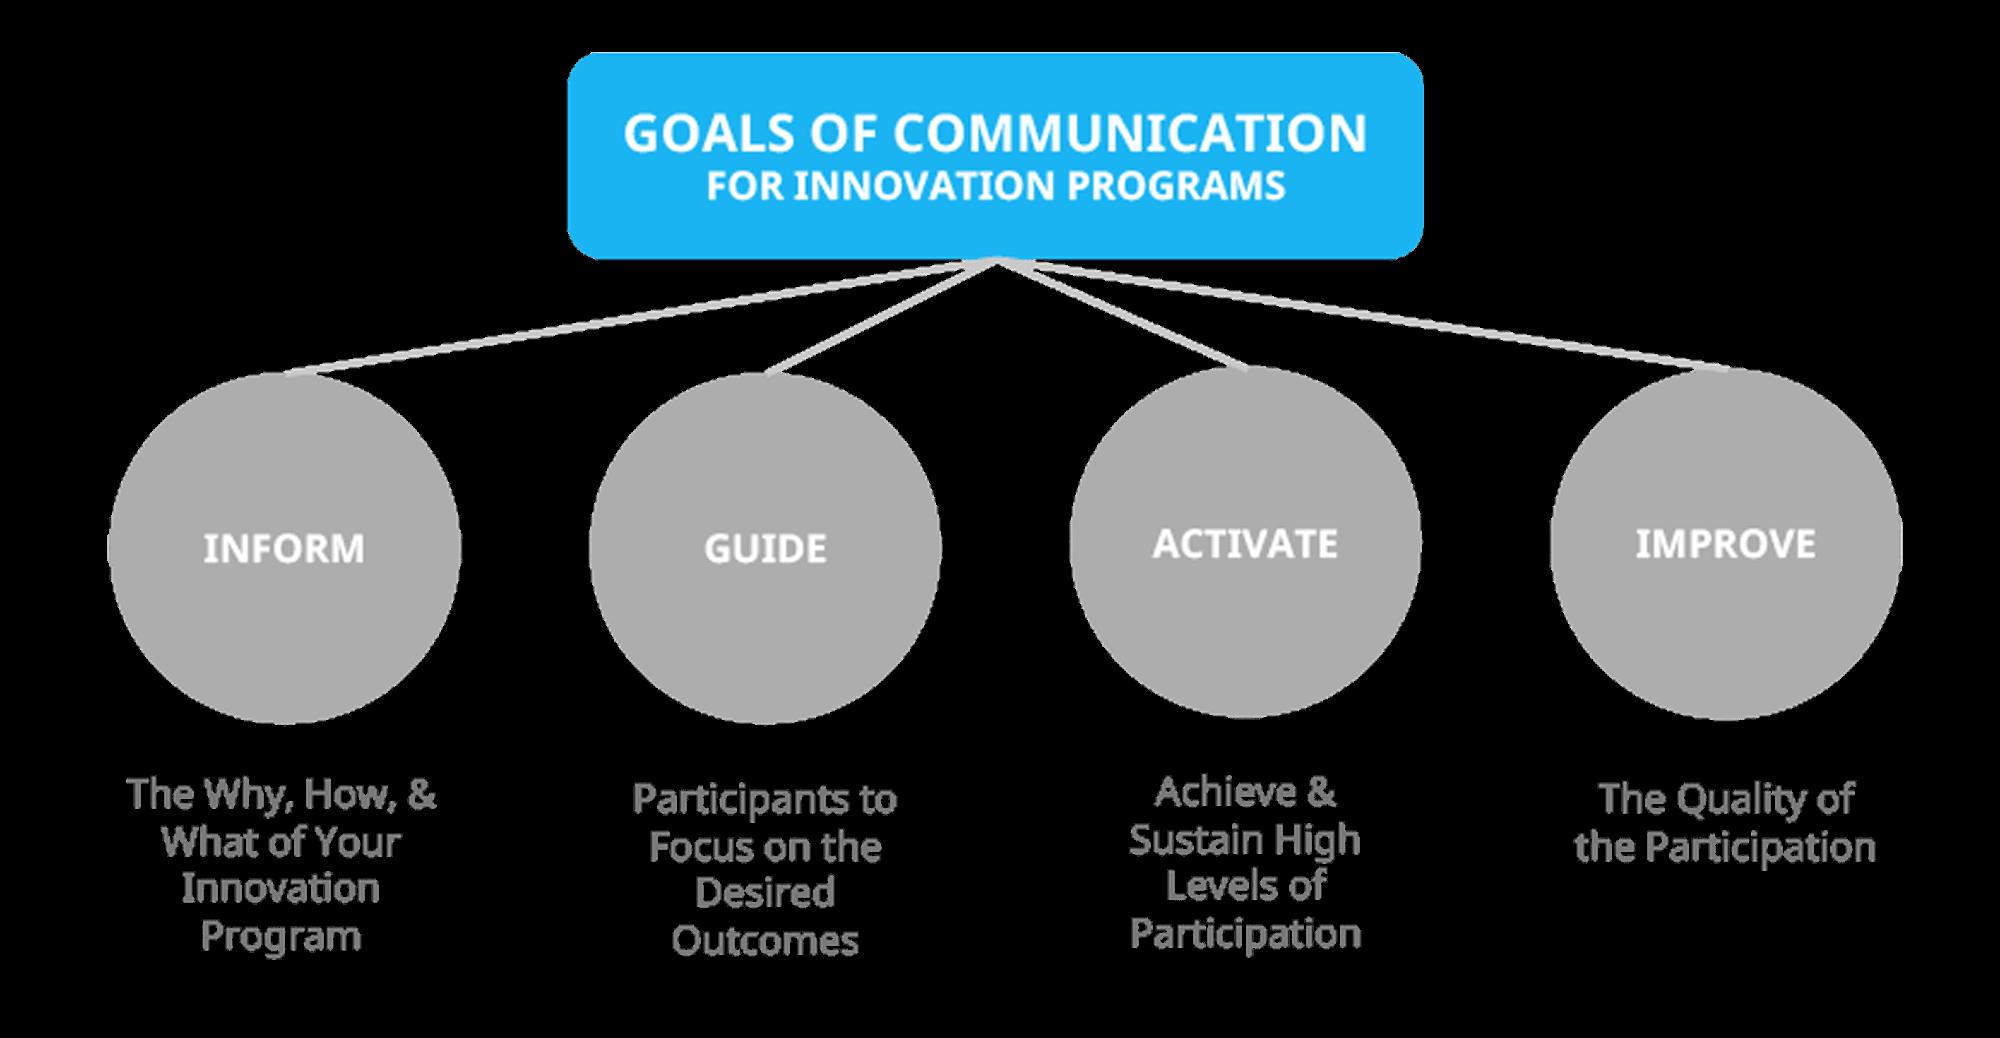 Goals of communication in innovation programs